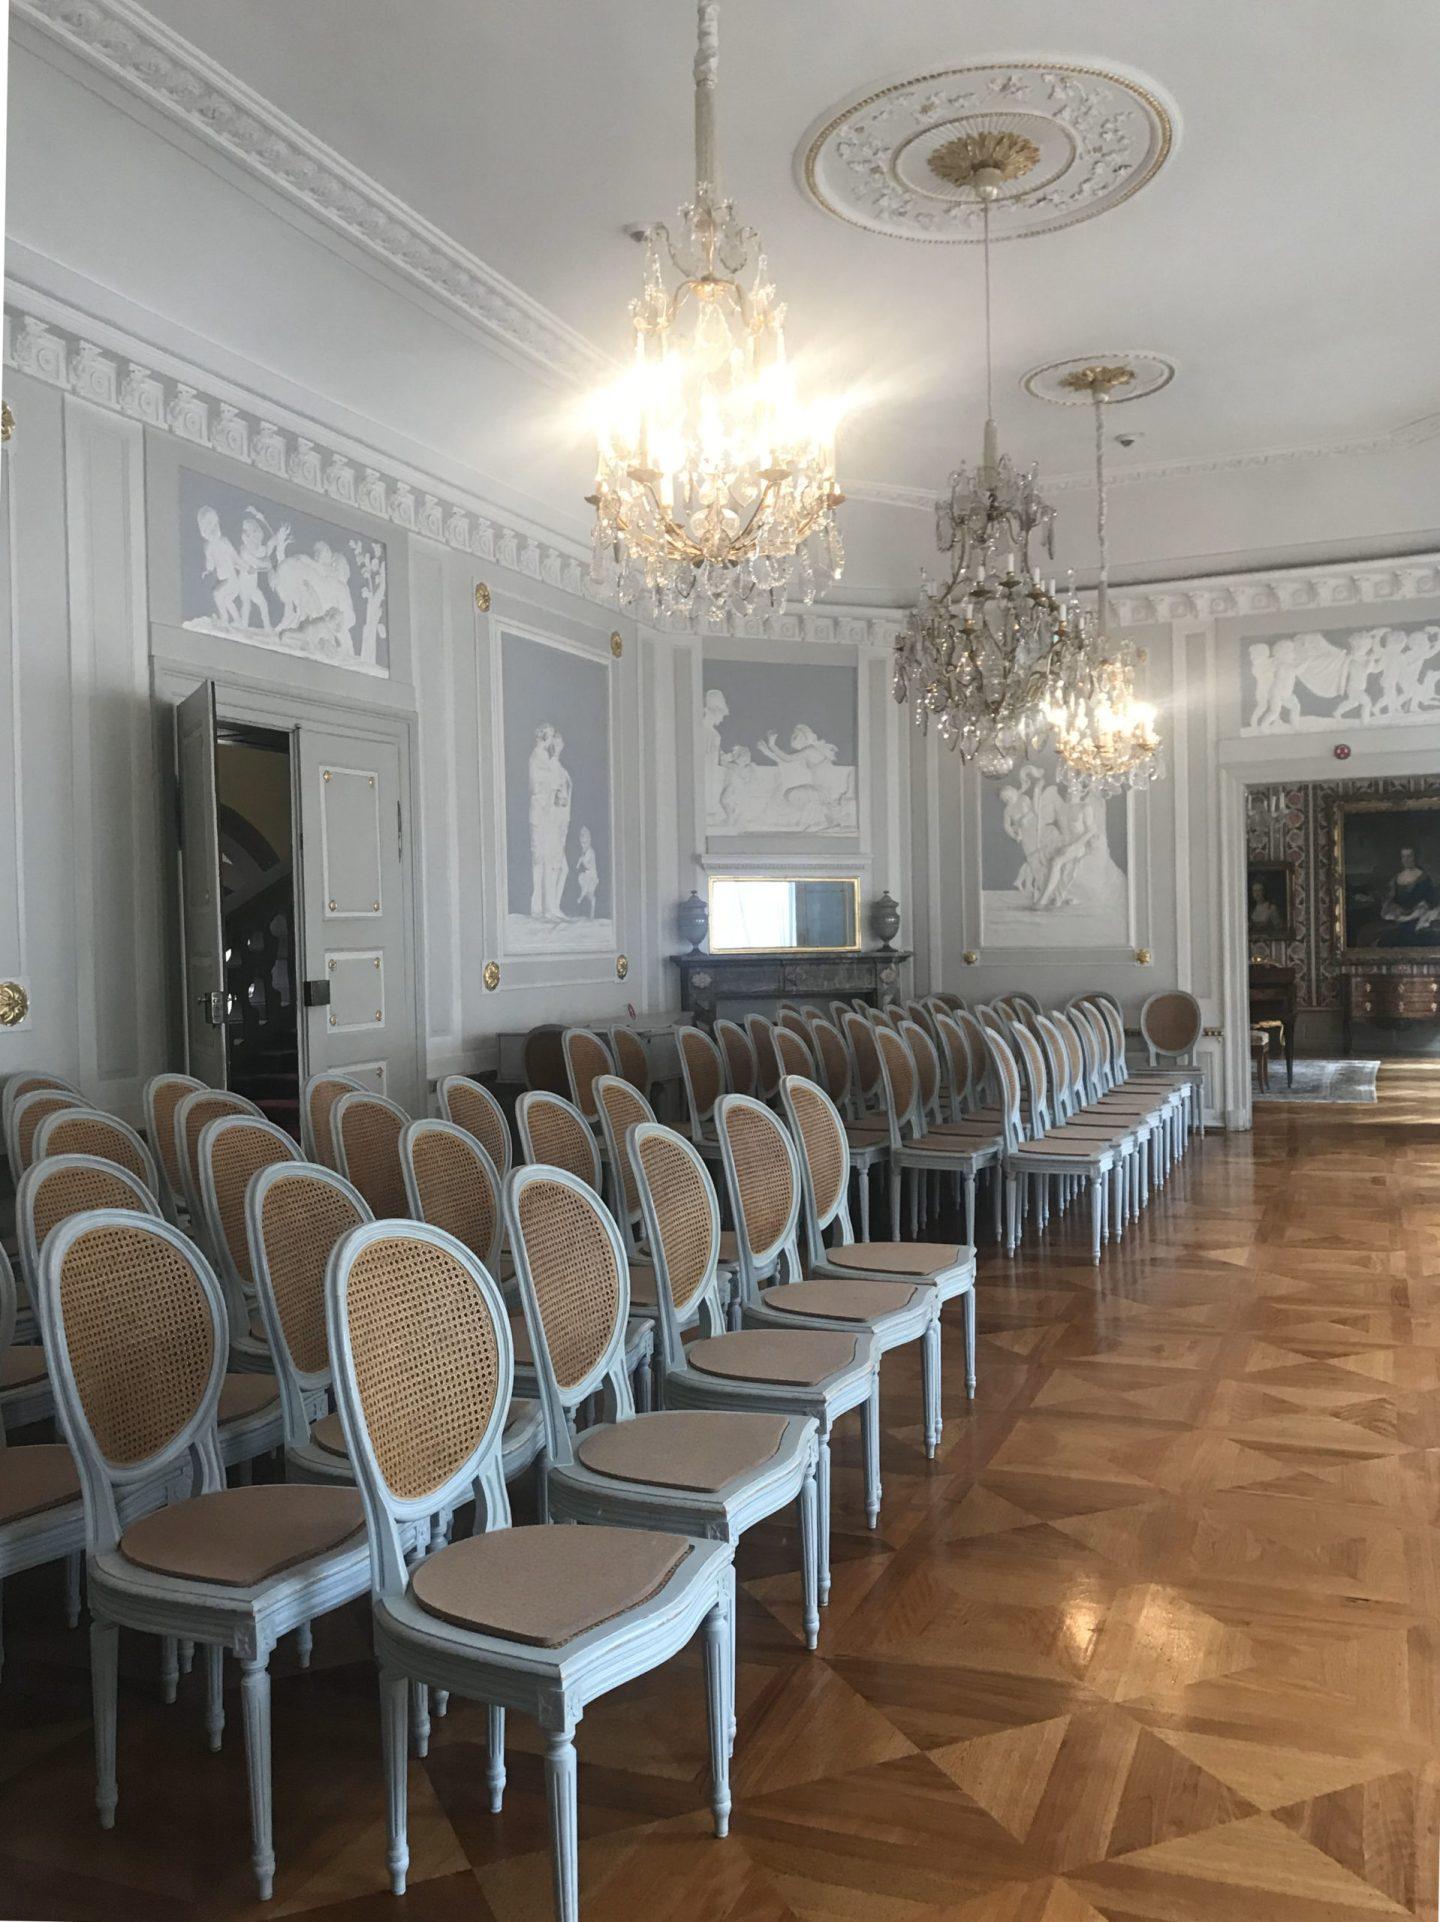 kurpfaelsiches museum2